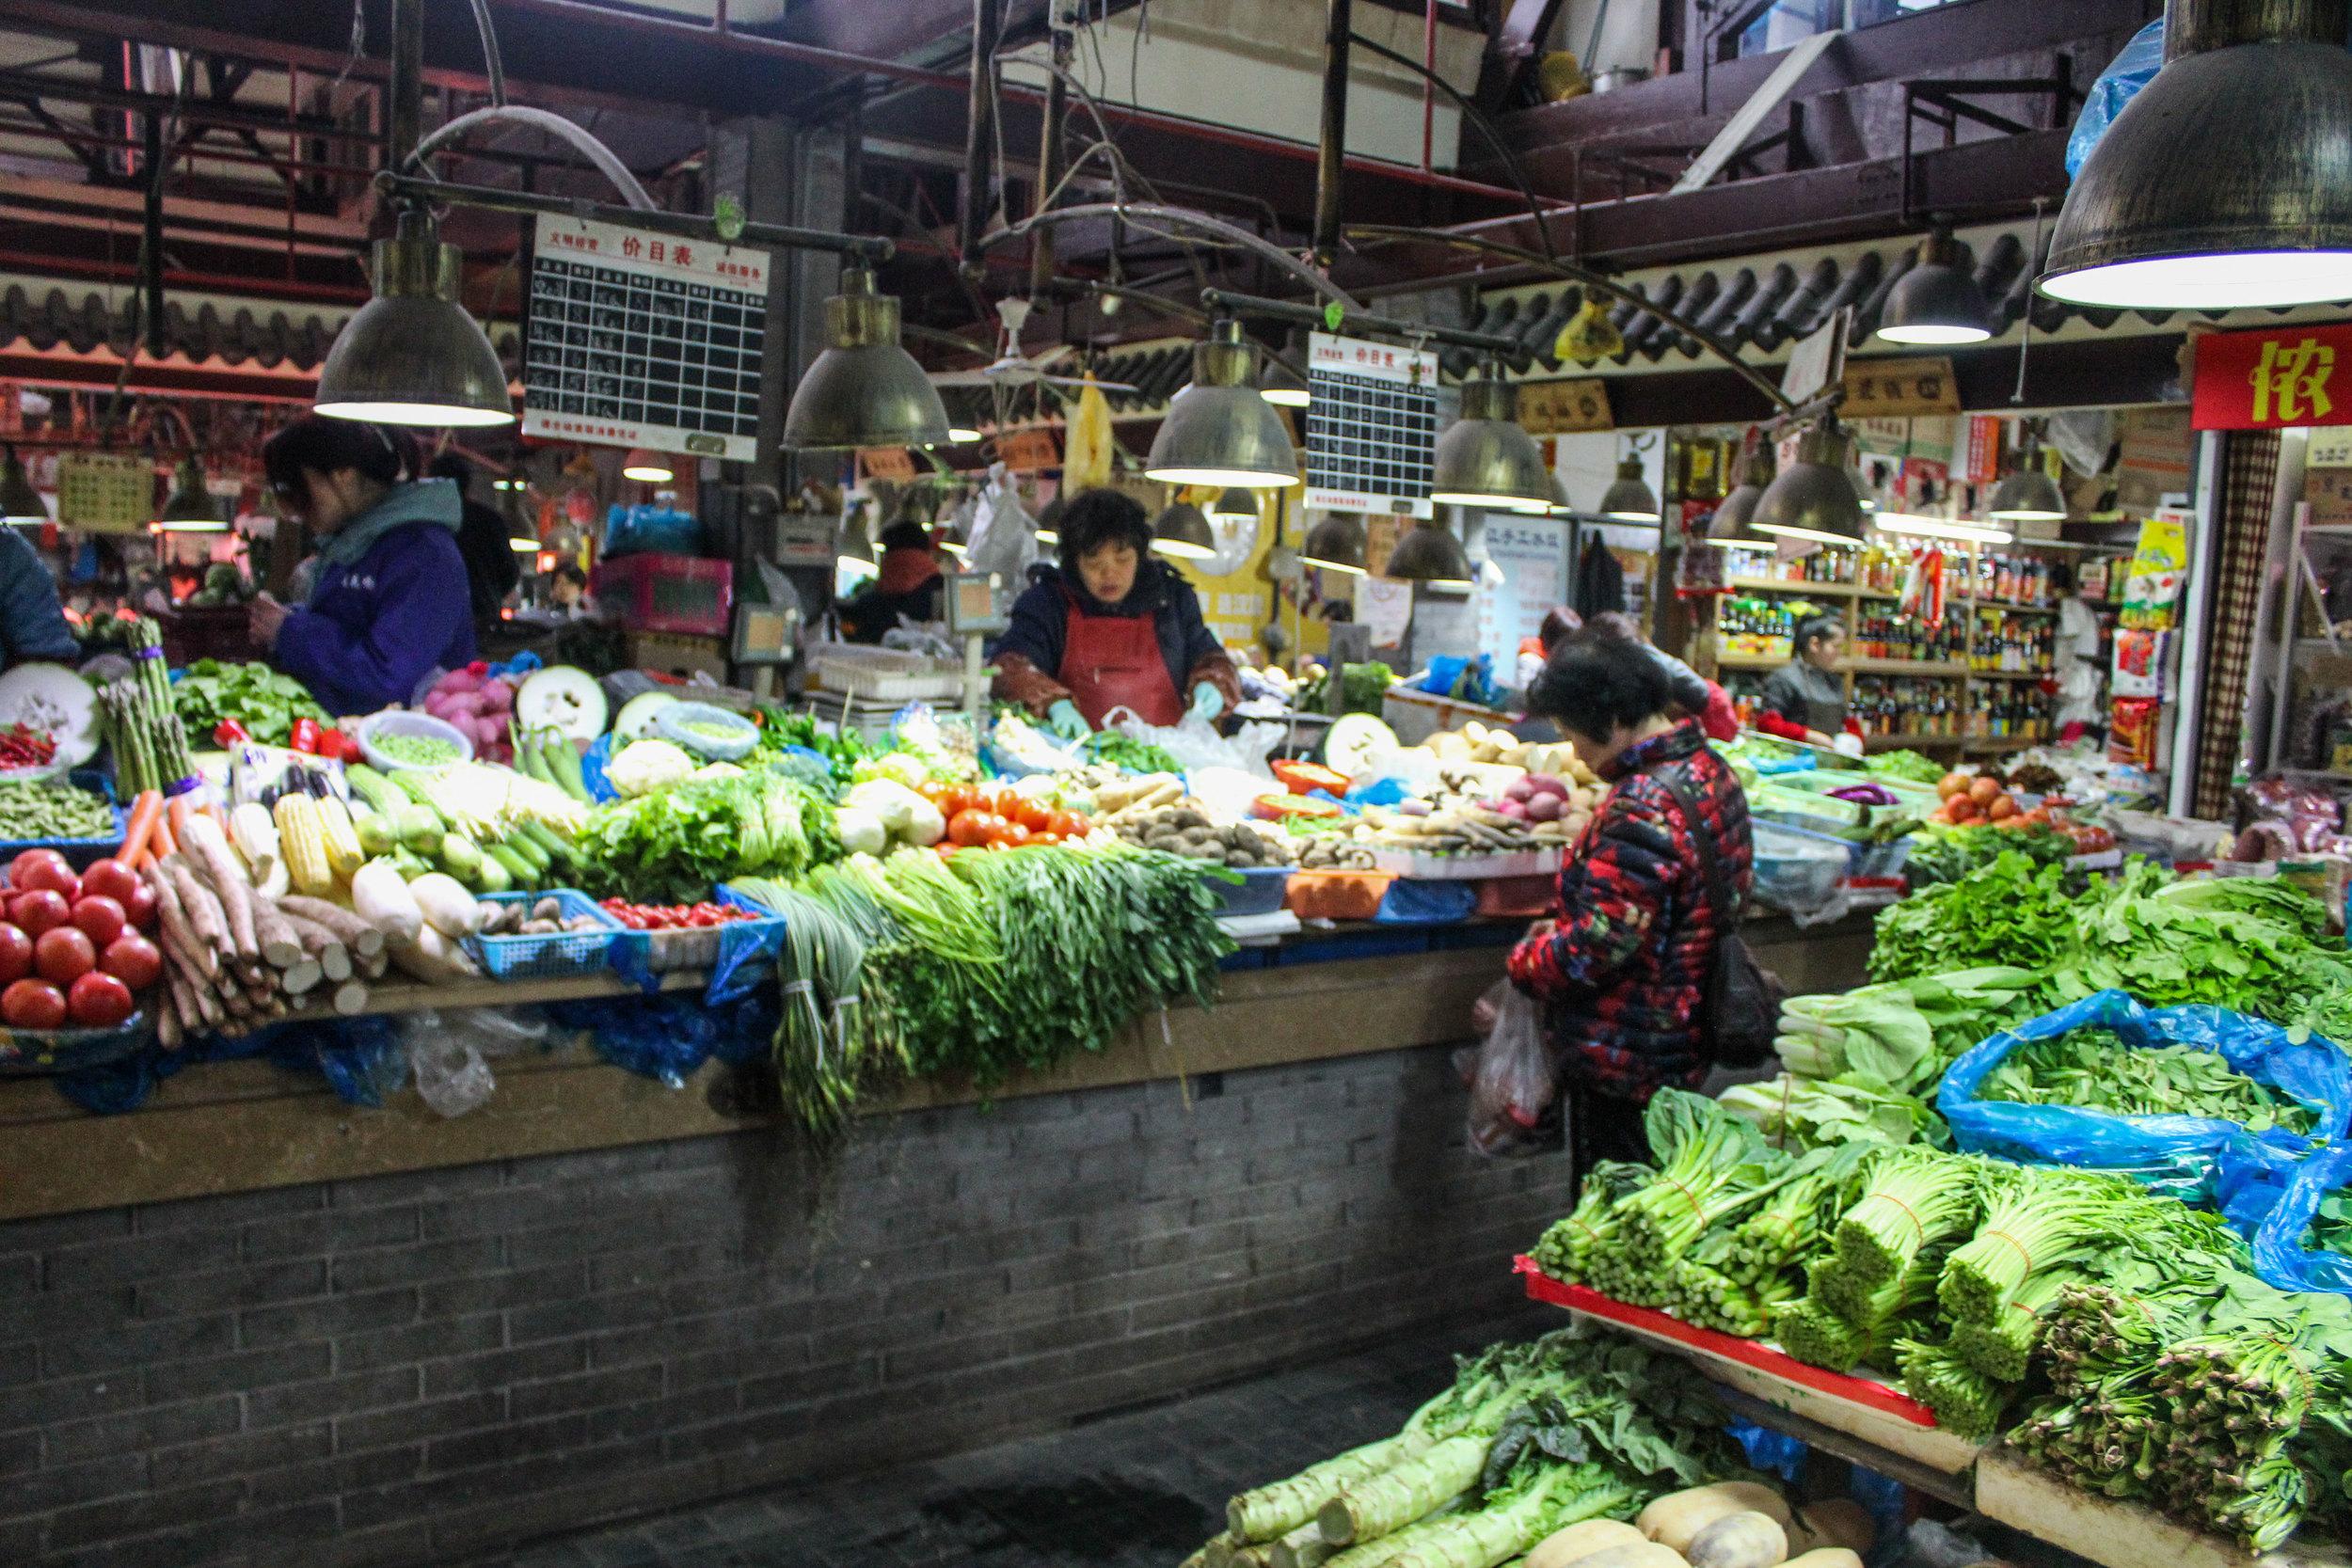 I appreciate these markets and their cornucopia of produce